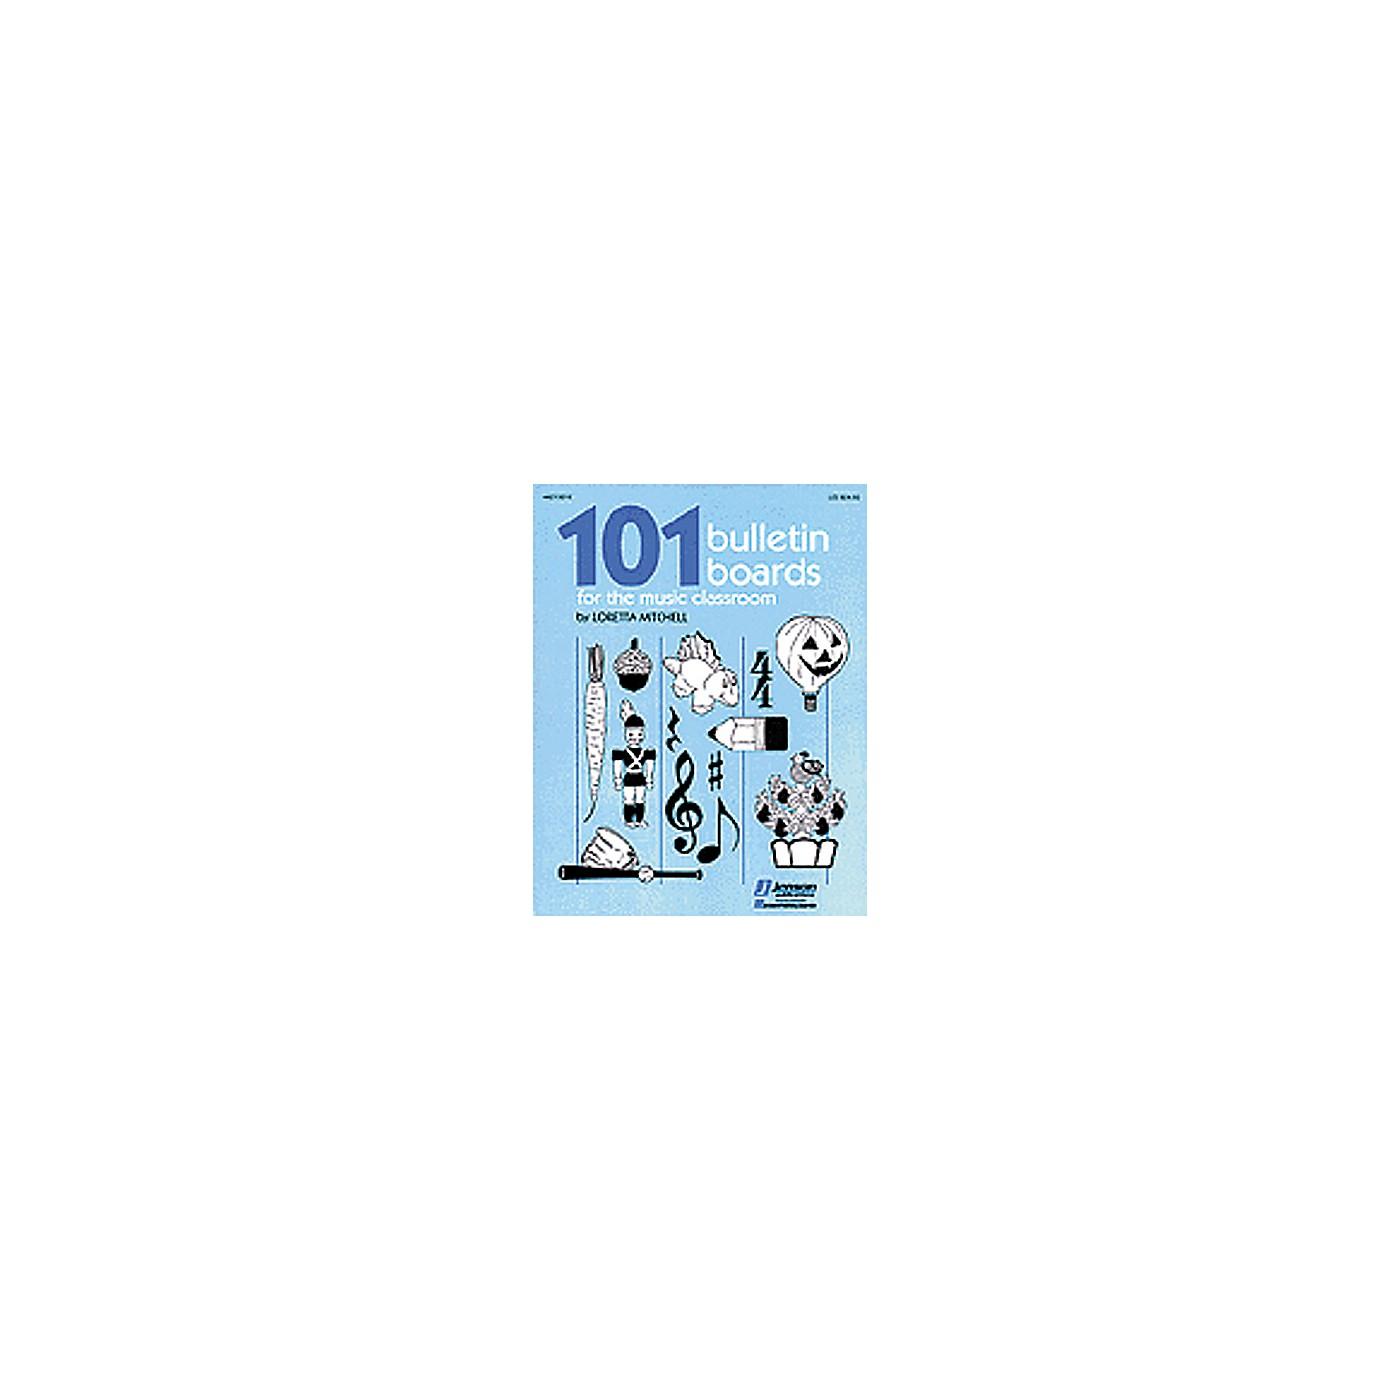 Hal Leonard 101 Bulletin Boards For the Music Classroom Book thumbnail